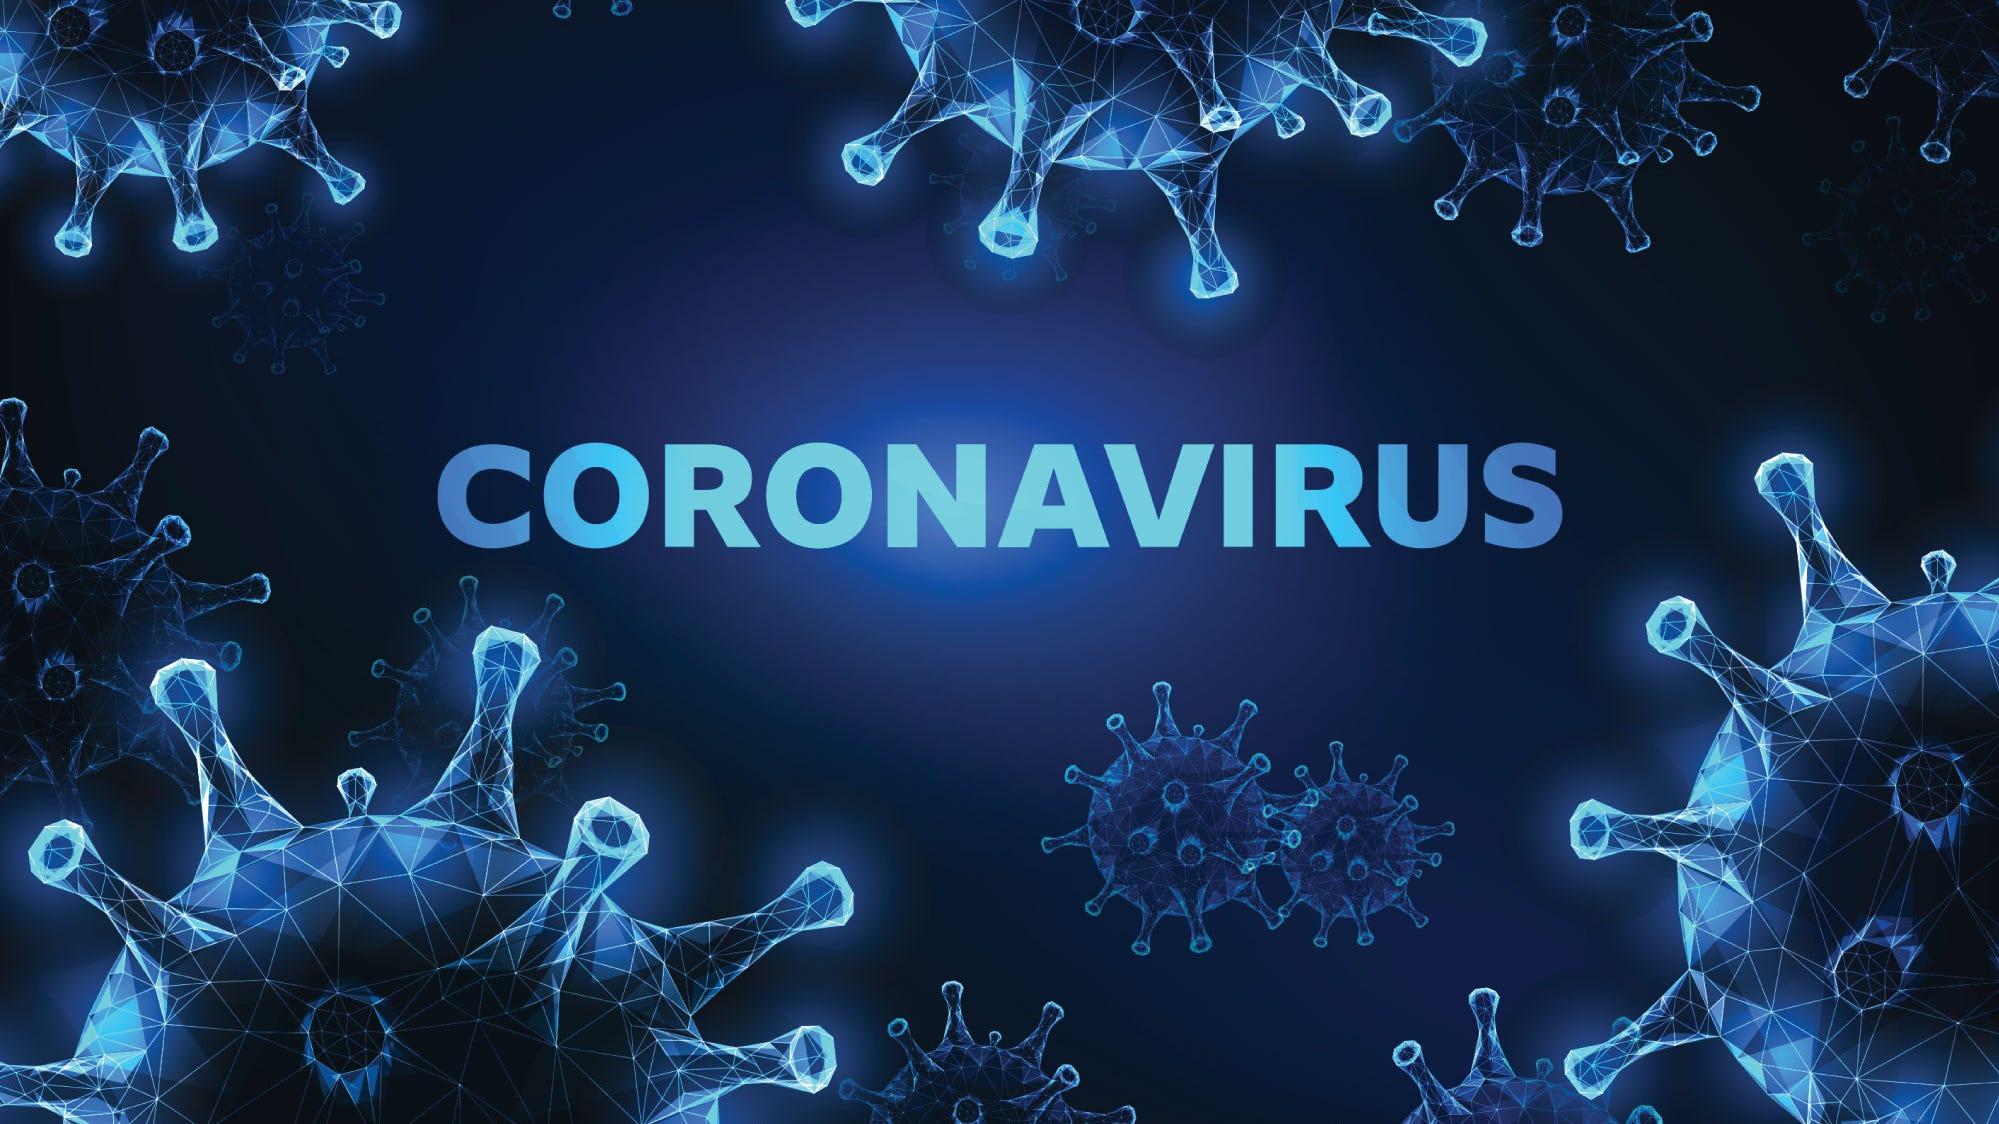 76371fbf 6397 44b6 a9ac 723f2cd4bc12 Coronavirus graphic3 jpg?crop=1999,1124,x0,y142&width=1999&height=1124&format=pjpg&auto=webp.'